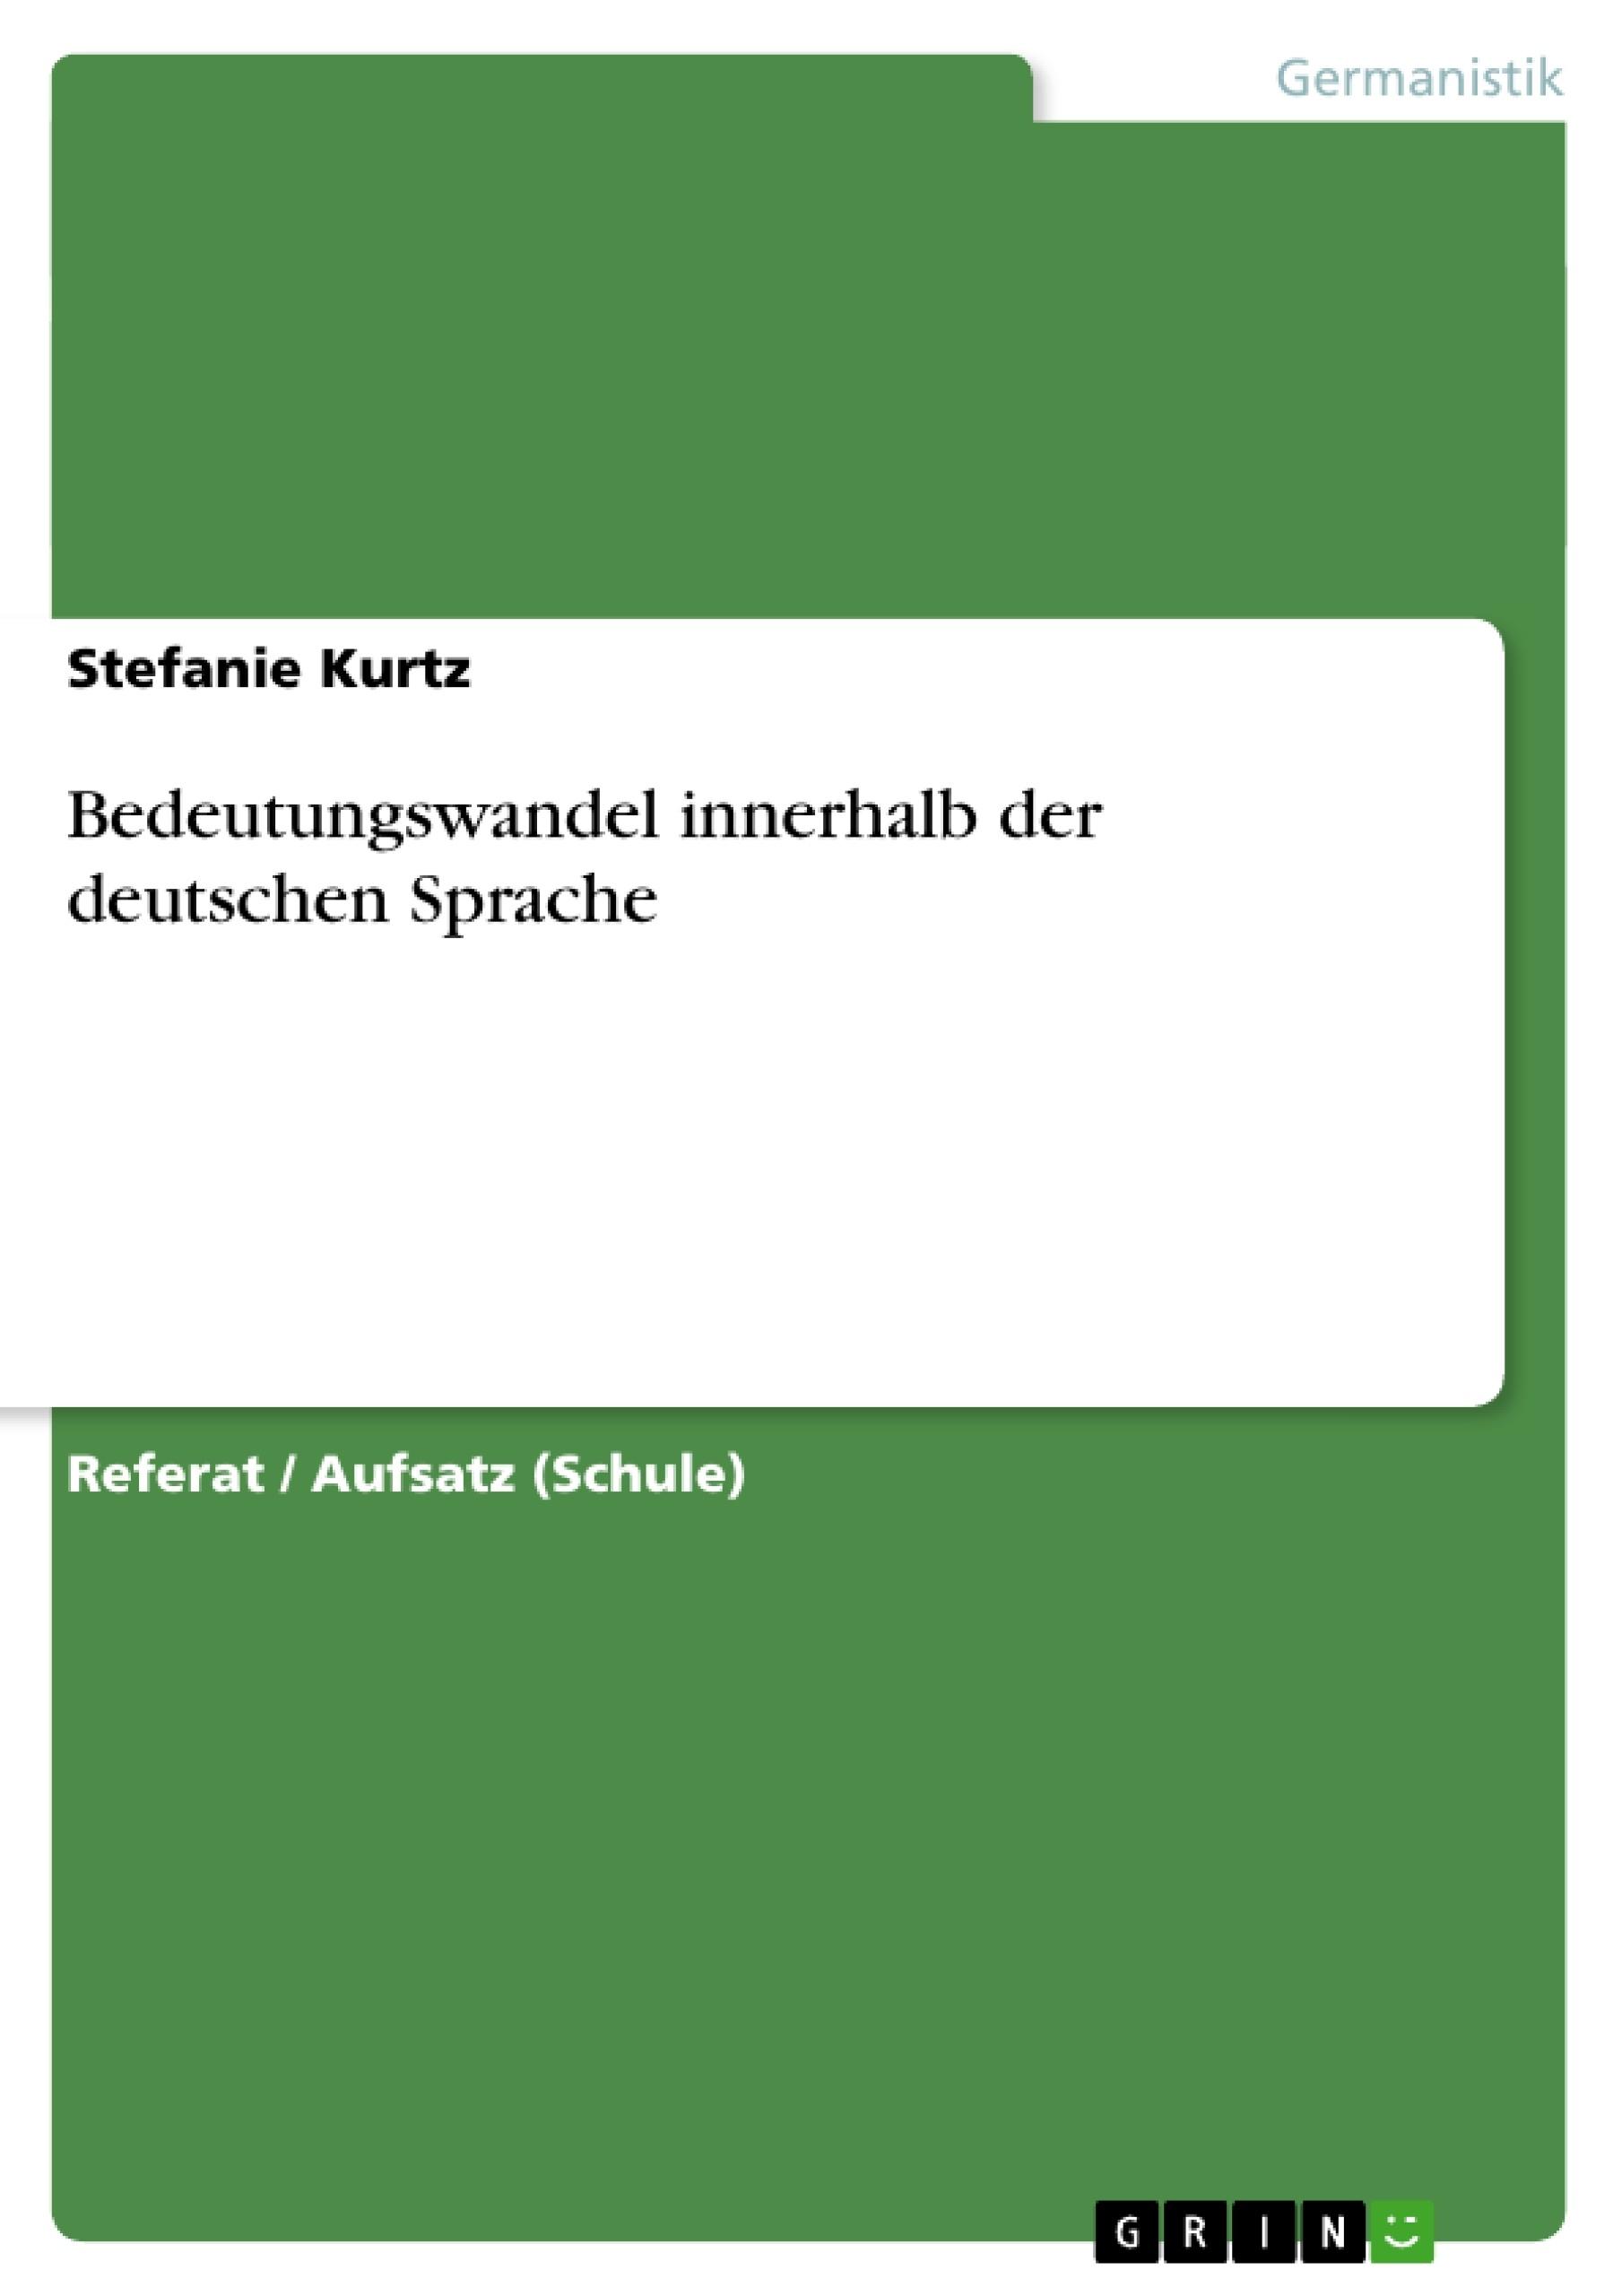 Colorful Semikolon Arbeitsblatt Festooning - Mathe Arbeitsblatt ...